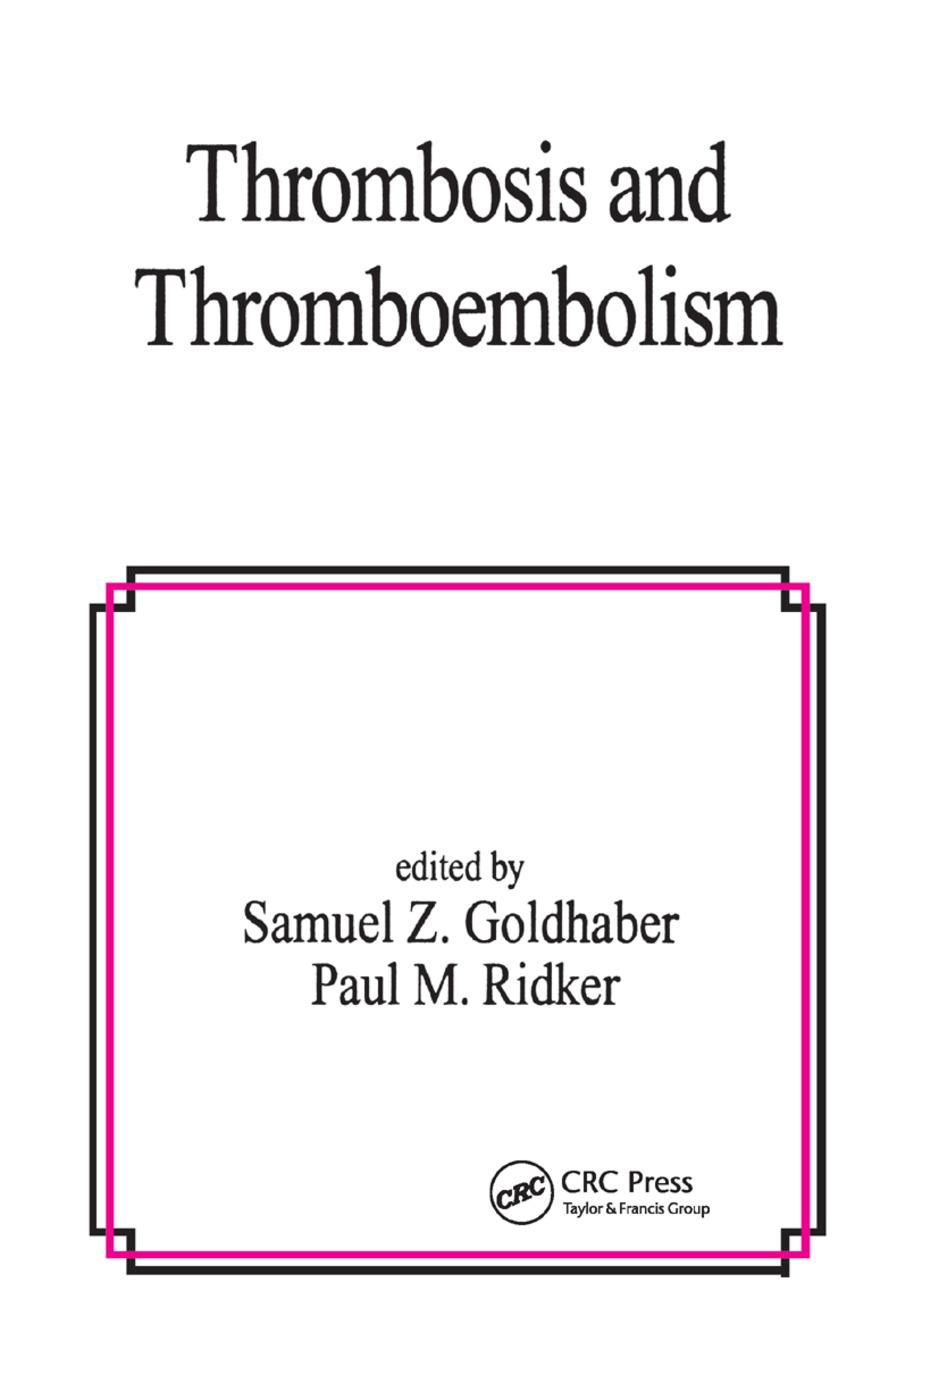 Thrombosis and Thromboembolism